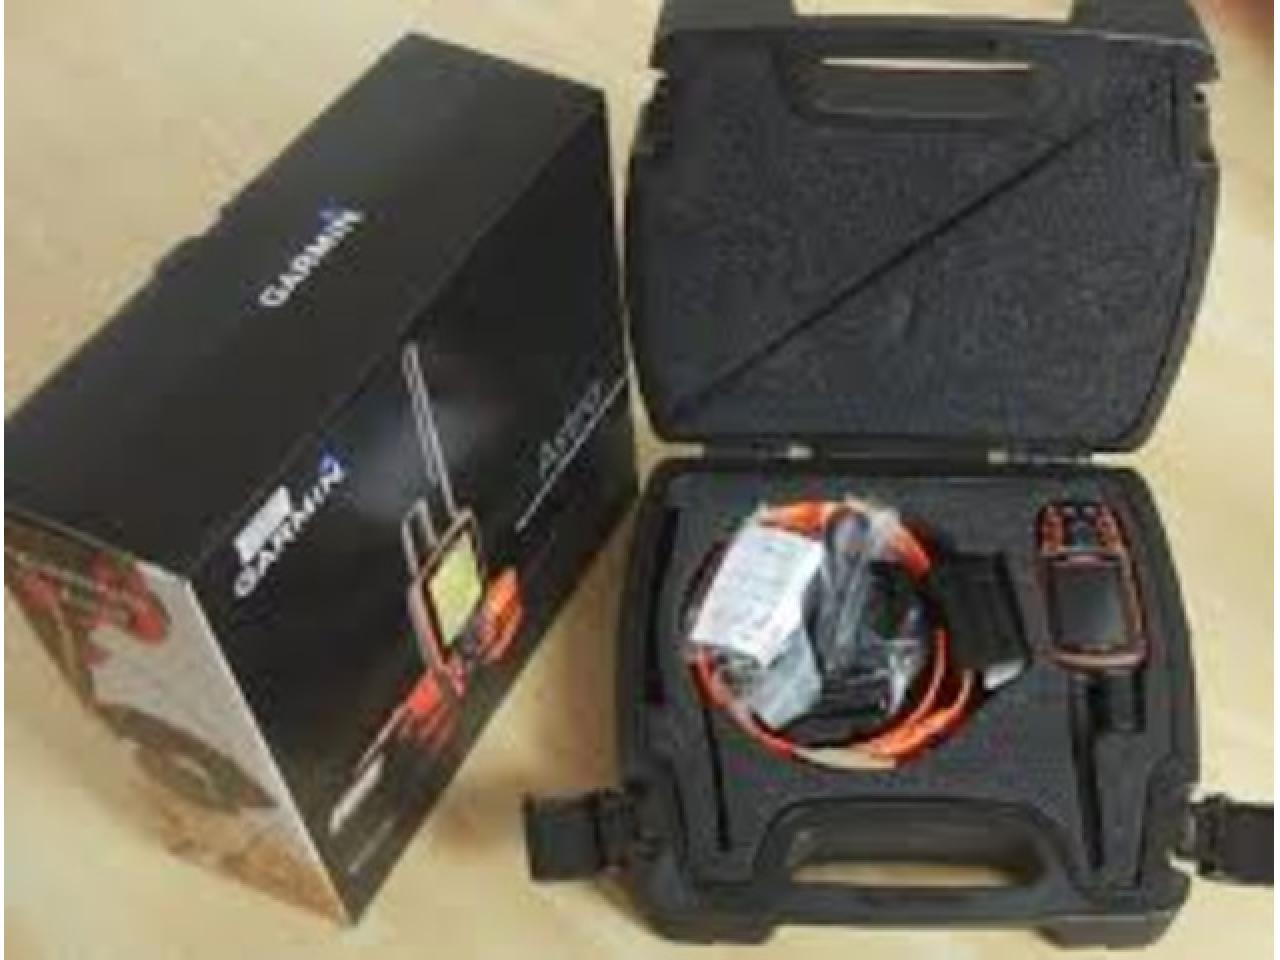 Garmin astro 320 / Alpha 100 / Sportdog Tek 2.0 Handheld with dc 30 DC40 DC50 T5. TT15 Ошейники ETC. - 2